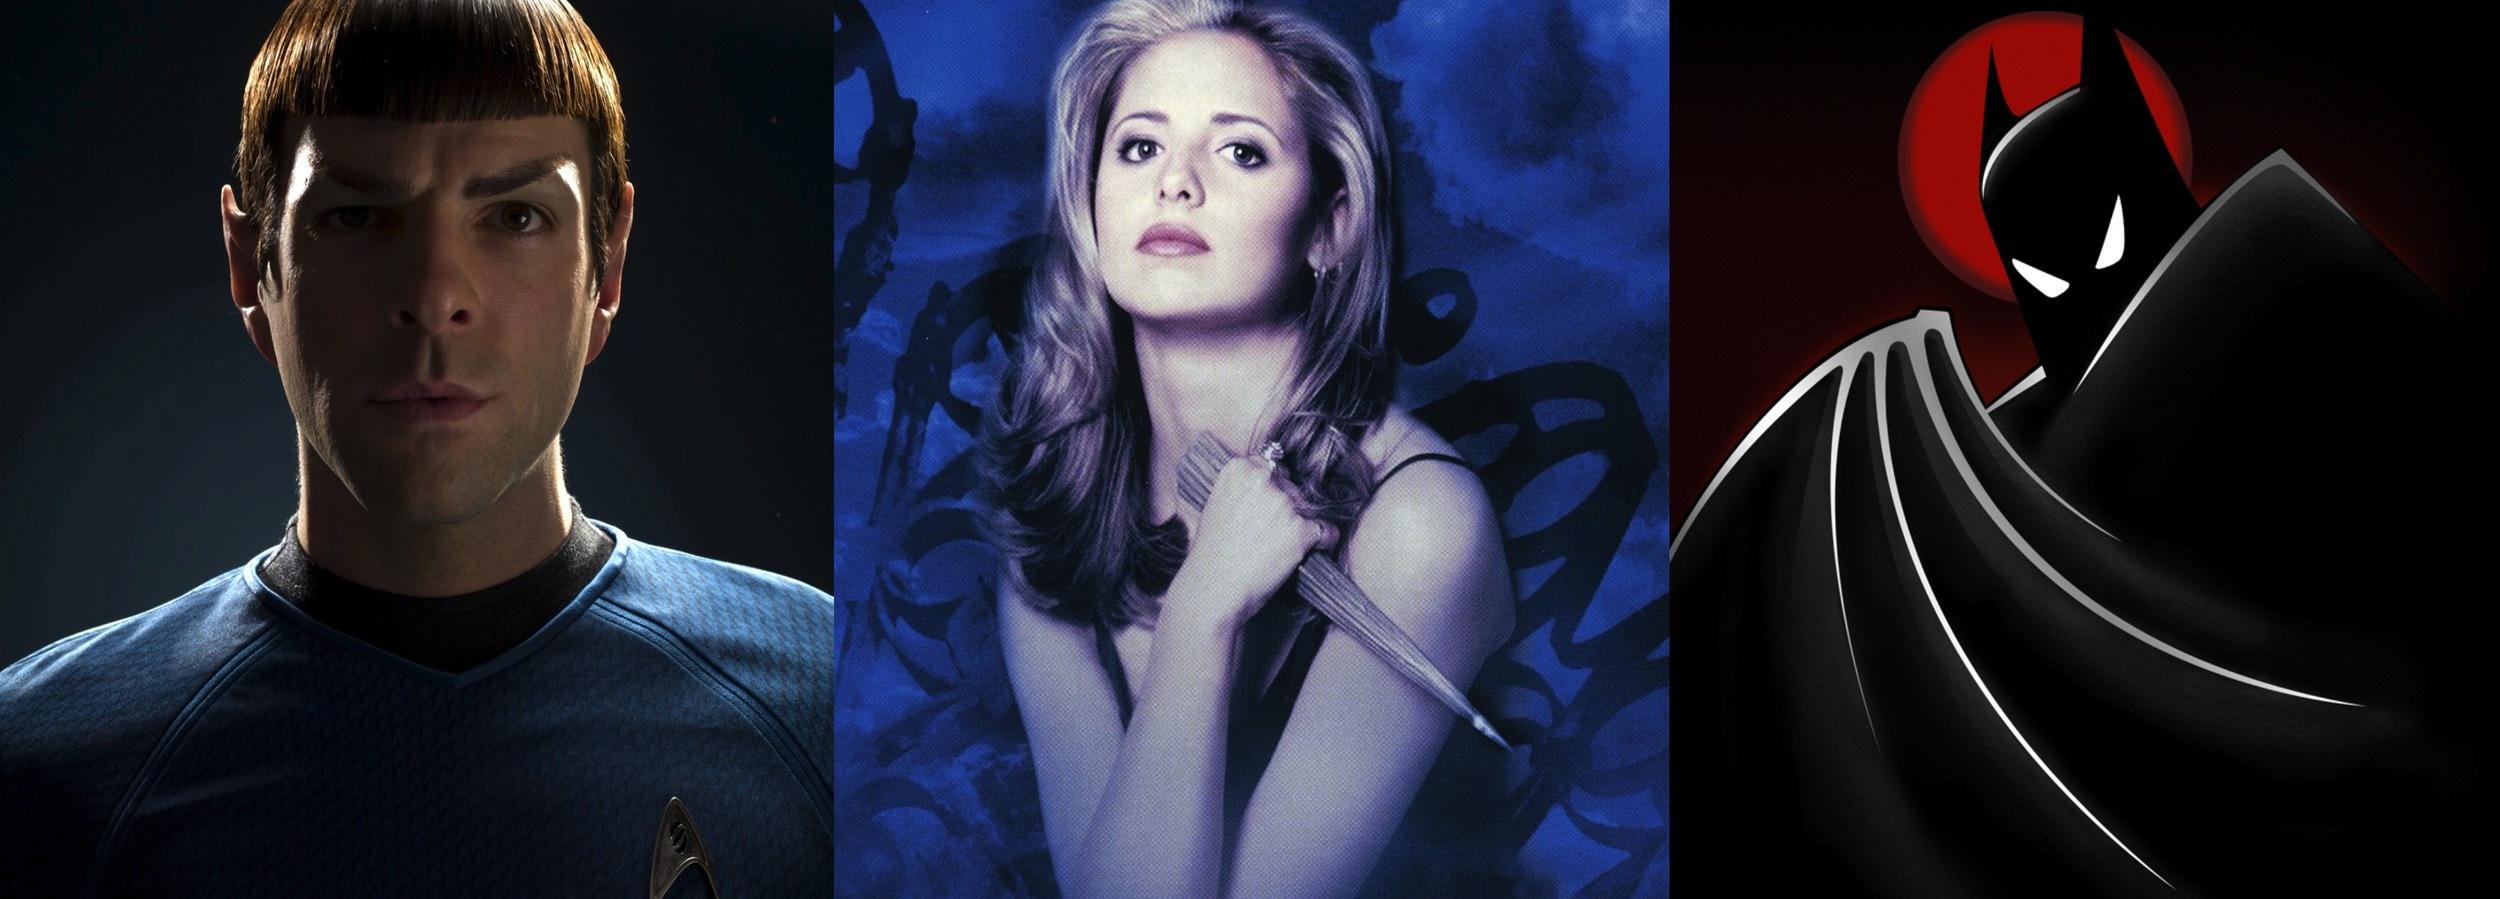 Spock (Star Trek 2009), Buffy the Vampire Slayer, Batman: The Animated Series